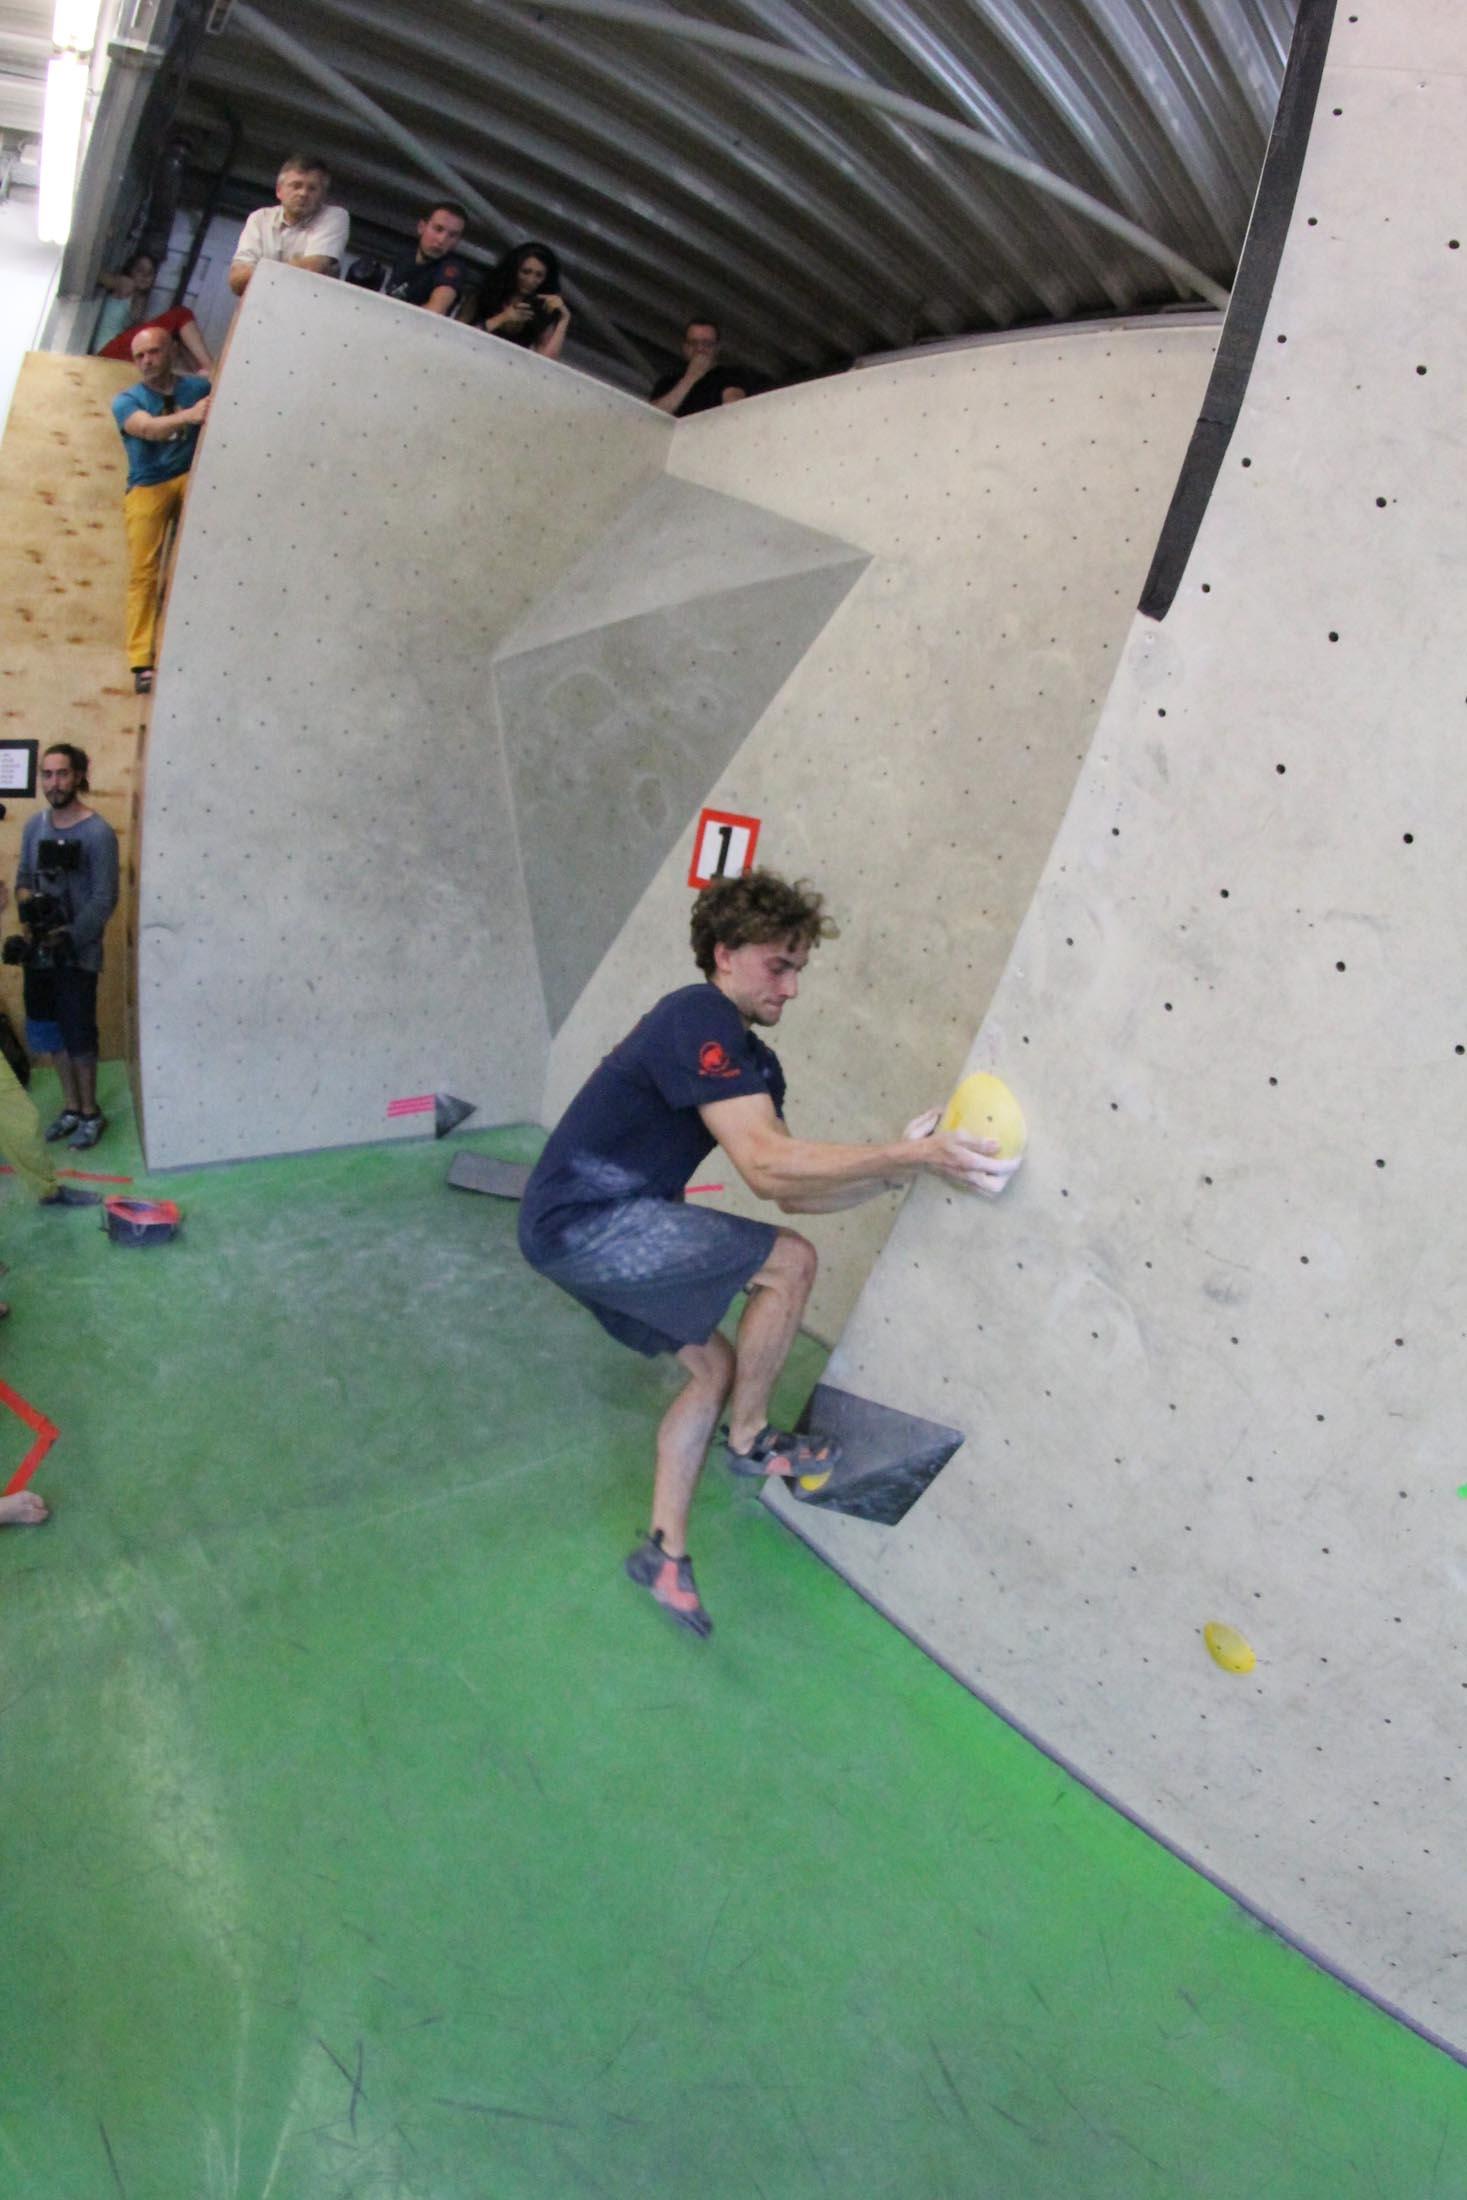 Finale, internationaler bouldercup Frankenjura 2016, BLOCKHELDEN Erlangen, Mammut, Bergfreunde.de, Boulderwettkampf07092016570